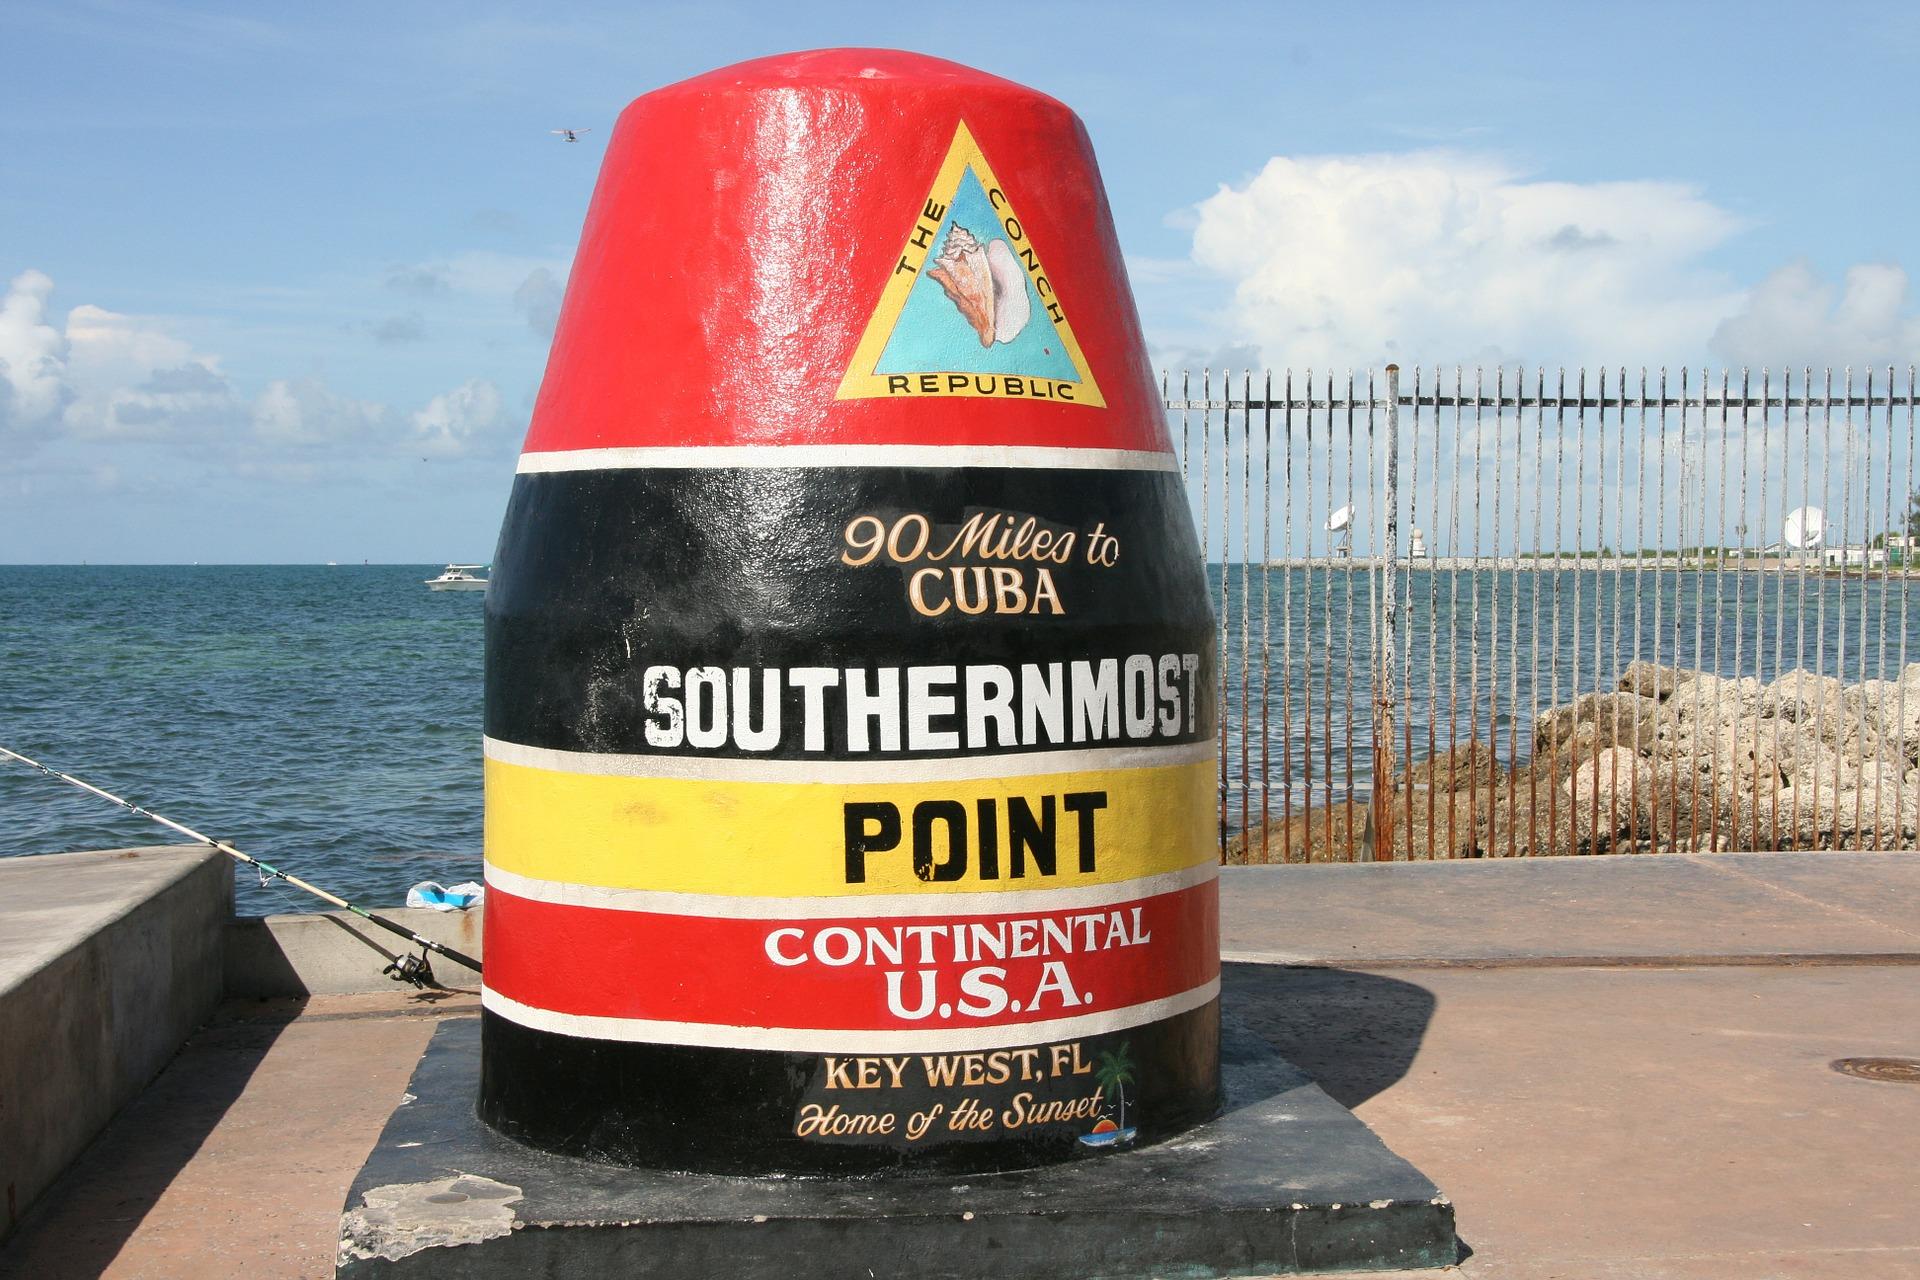 Florida Keys Vacation Rentals for Groups